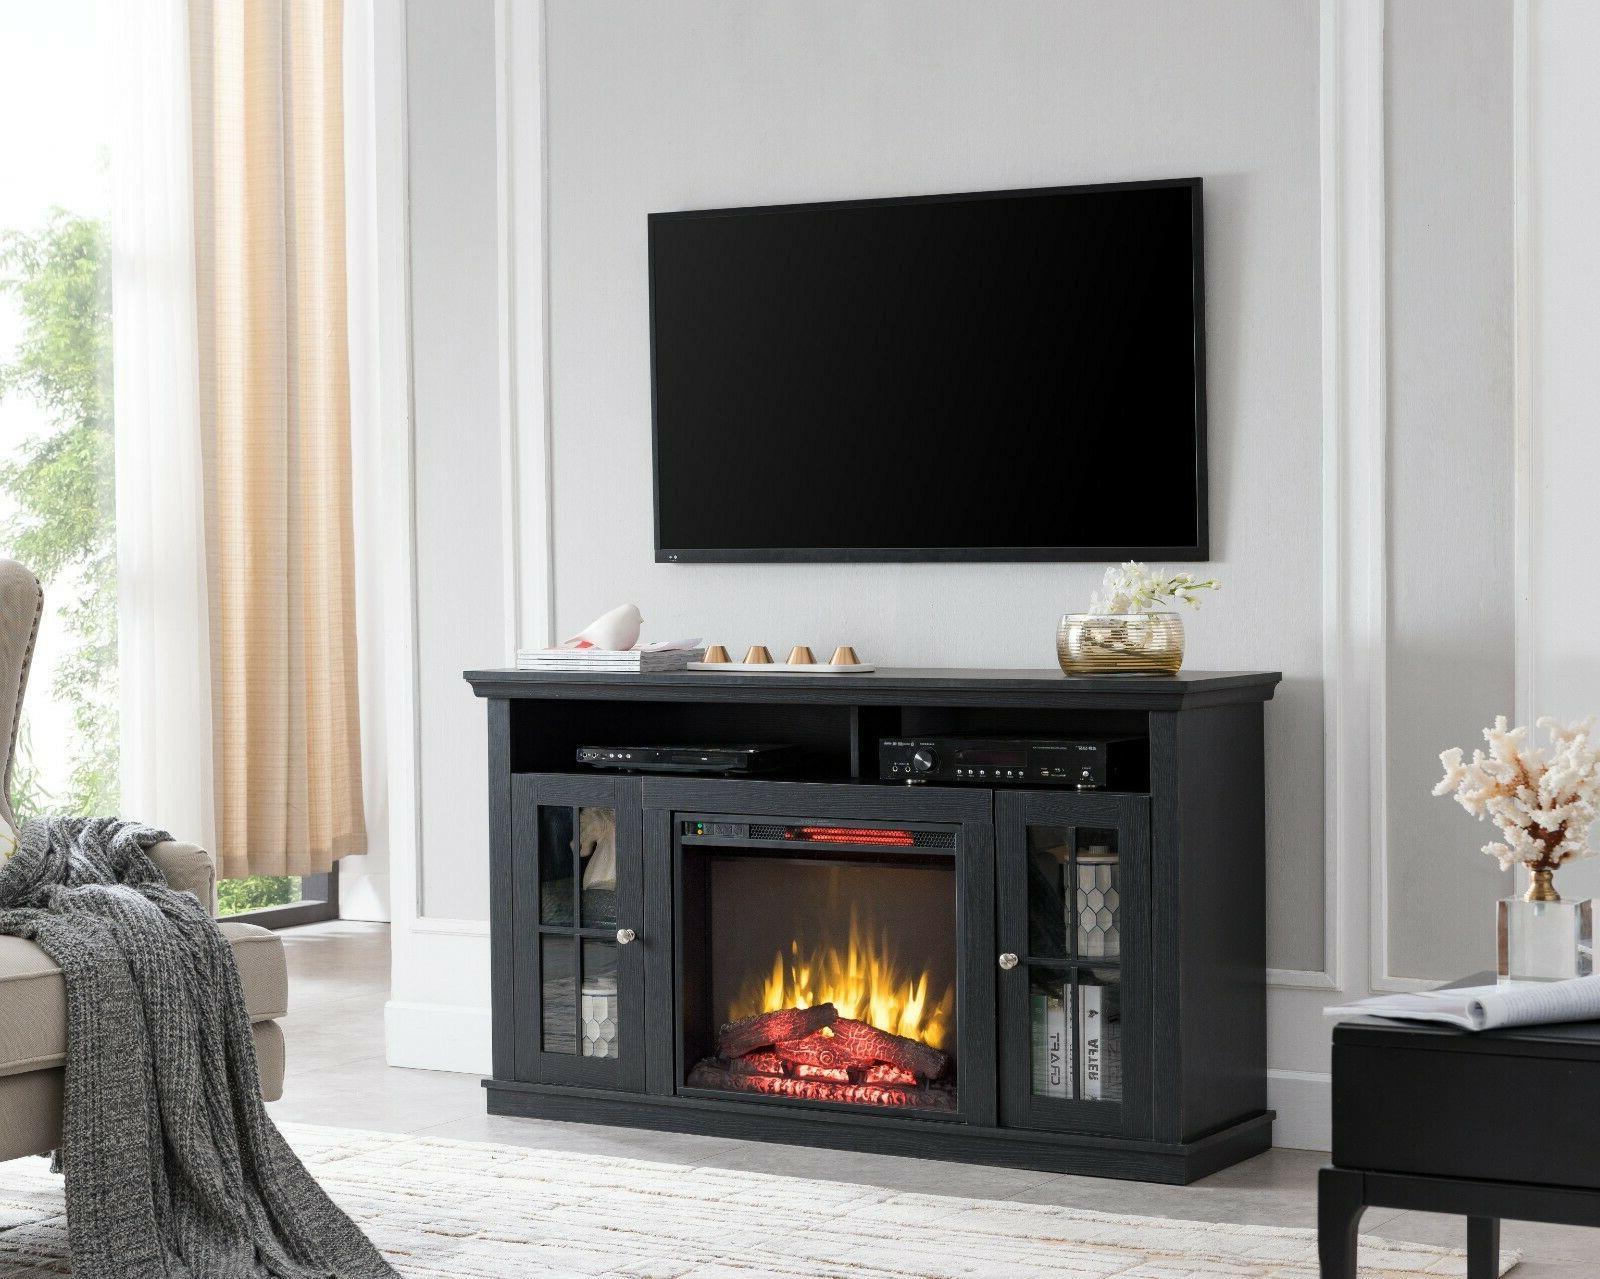 Modern Black Fireplace Unit Fits Up to Tv